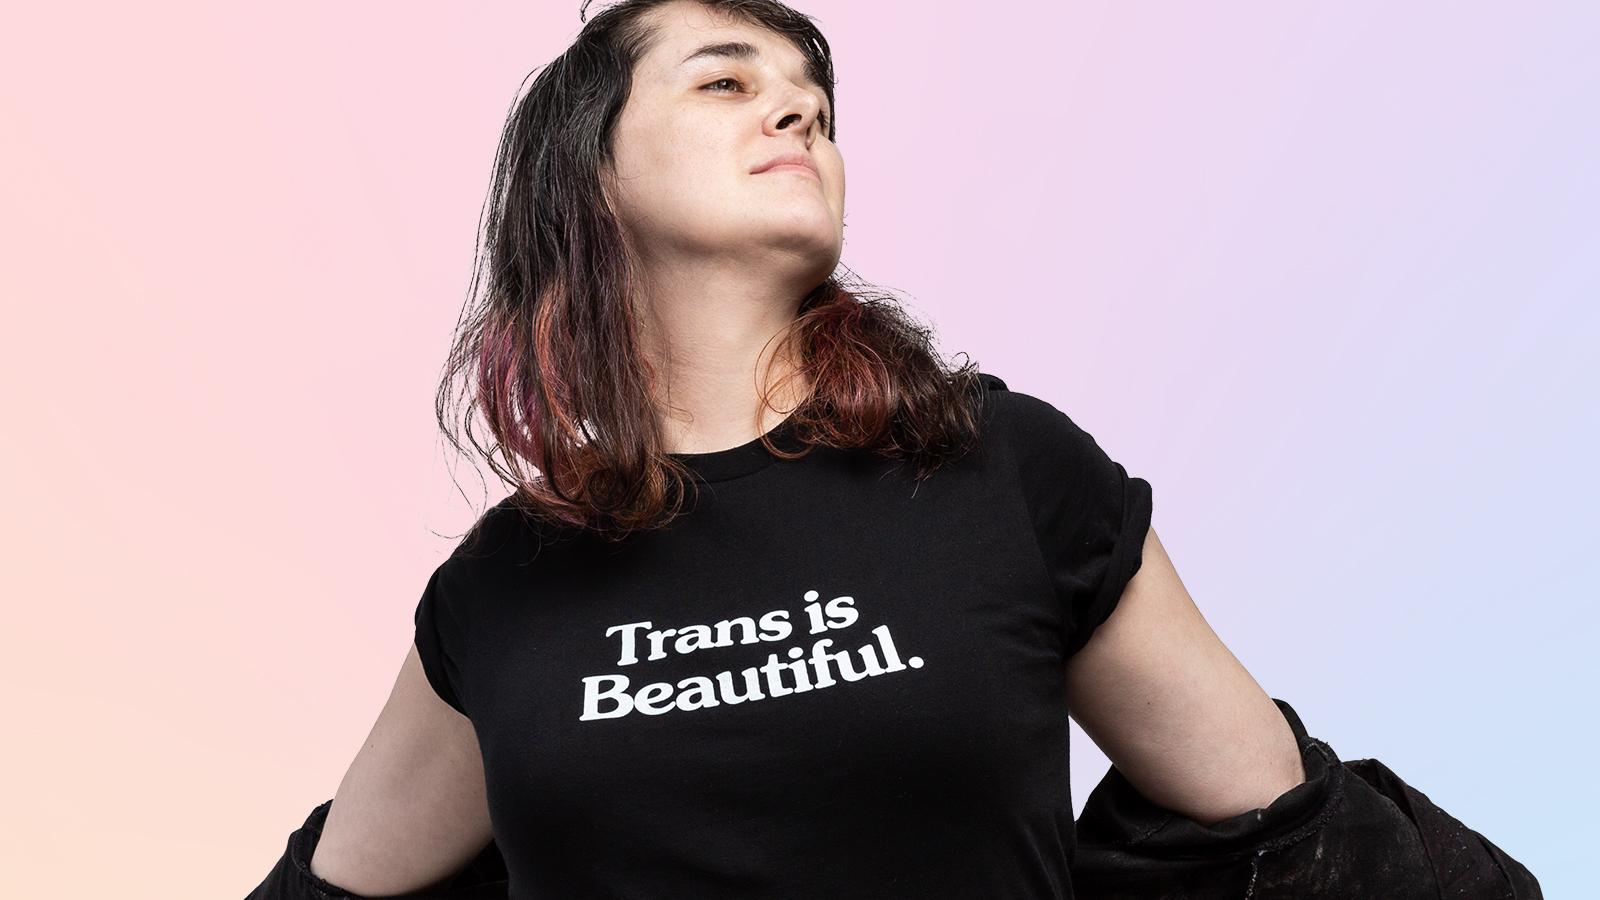 Trans is Beautiful Tee in black